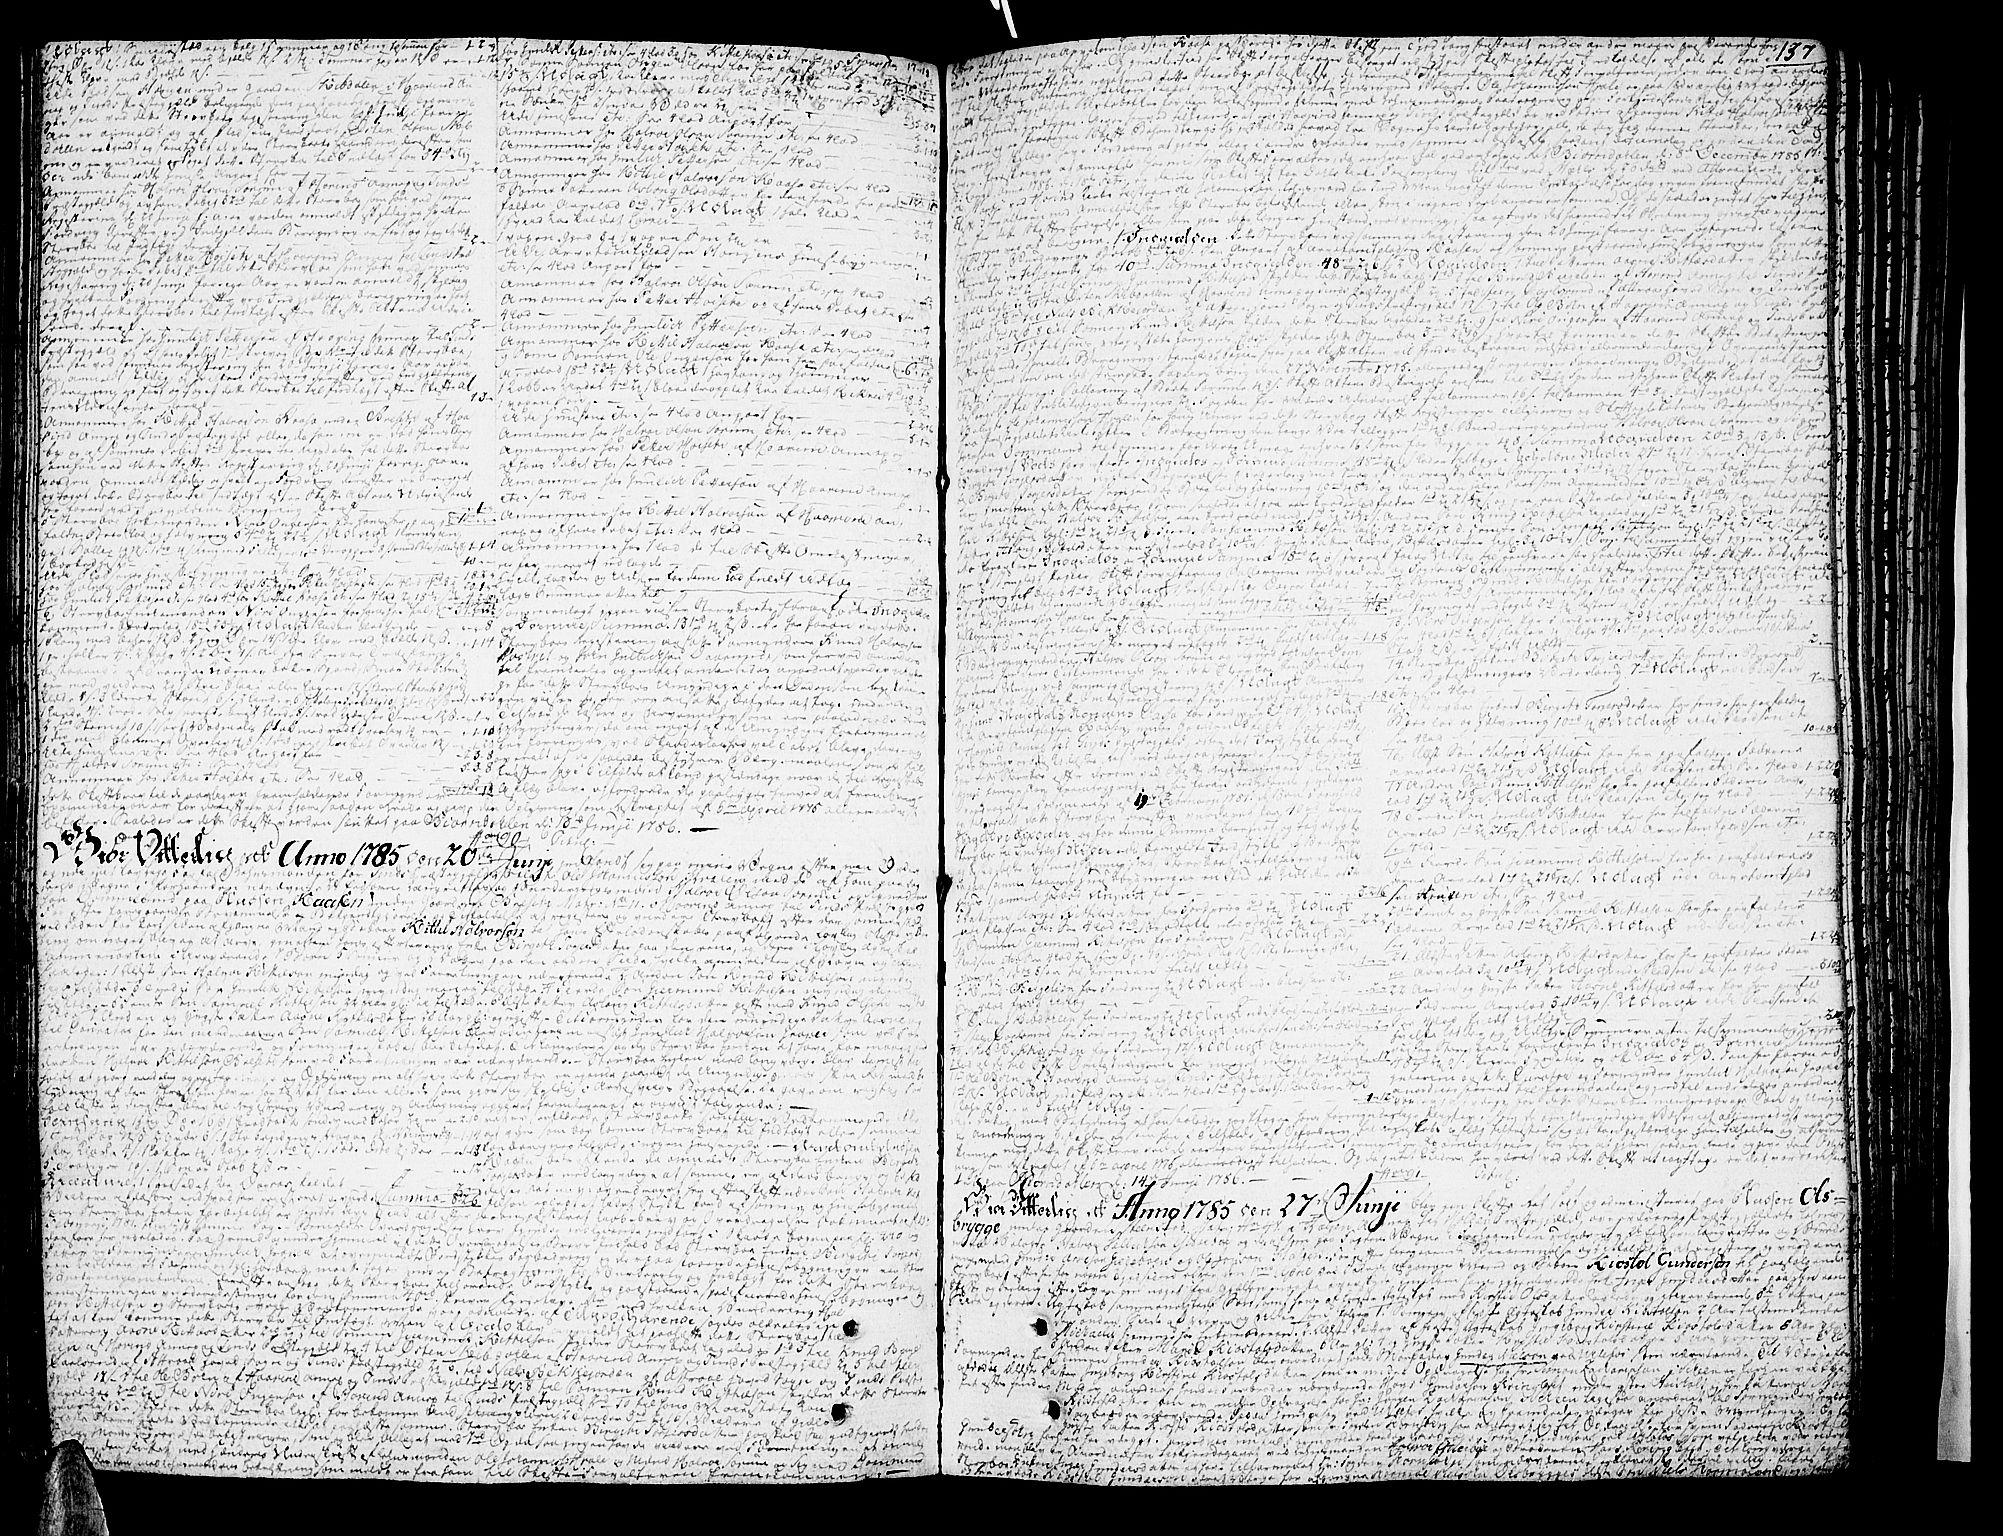 SAKO, Nedre Telemark sorenskriveri, H/Hb/Hba/L0016a: Skifteprotokoll, 1785-1792, s. 136b-137a